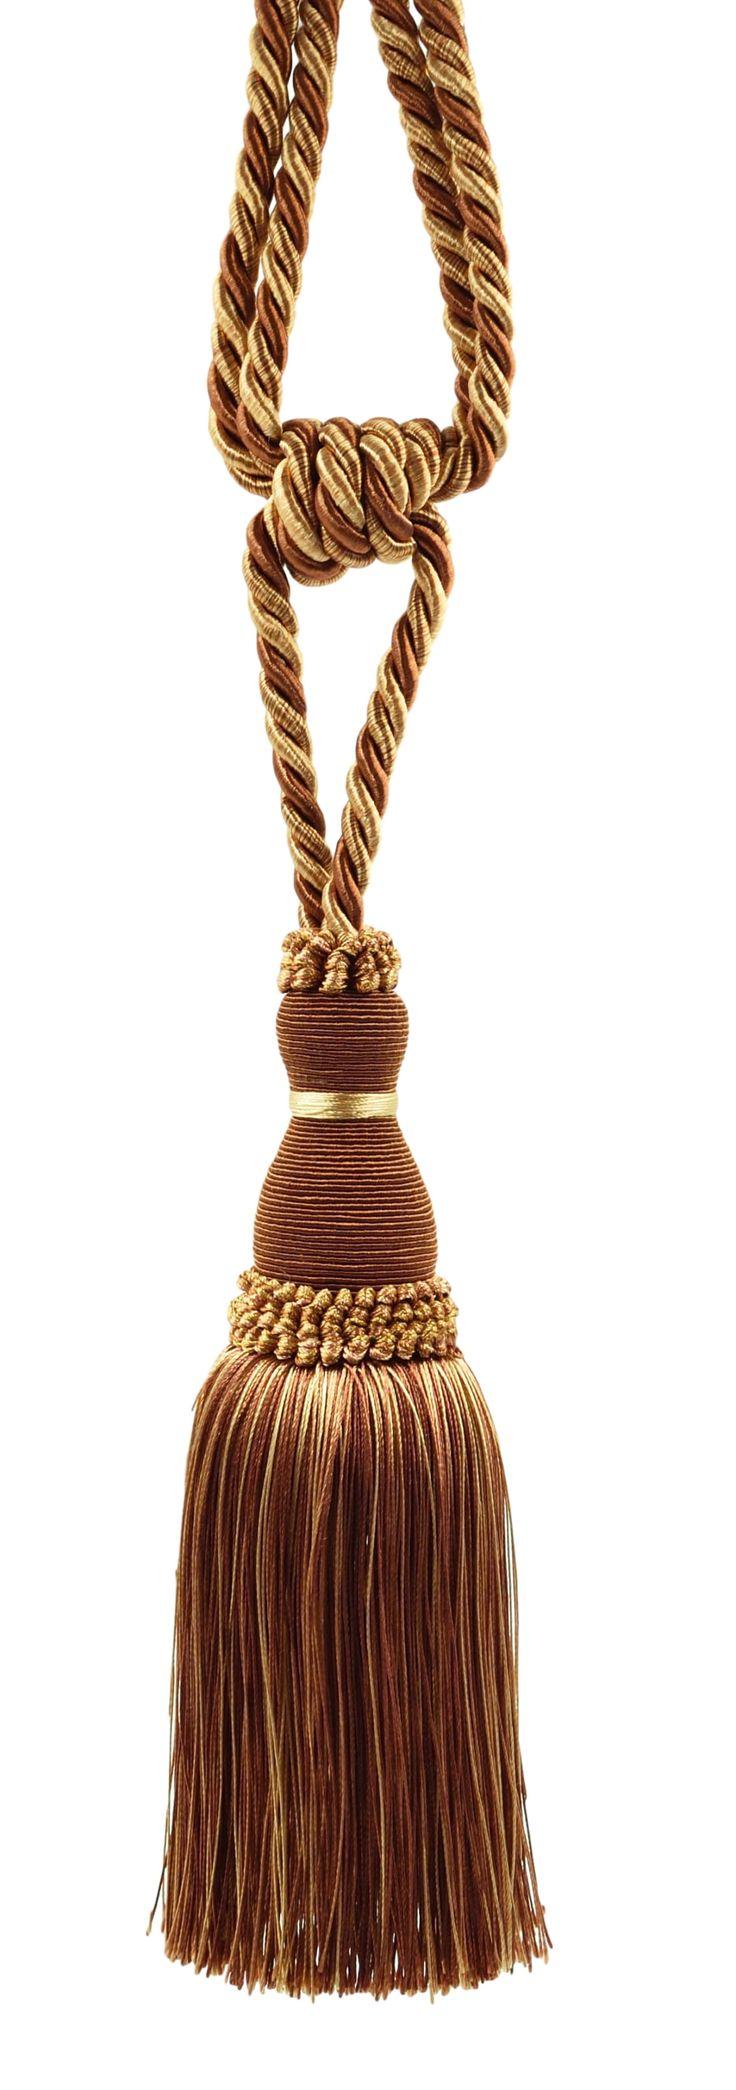 Elegant Brown, Light Gold Curtain & Drapery Tassel Tieback / 8 Inch tassel, 30 Inch Spread (embrace) Style# TBH8 - English Toffee 08